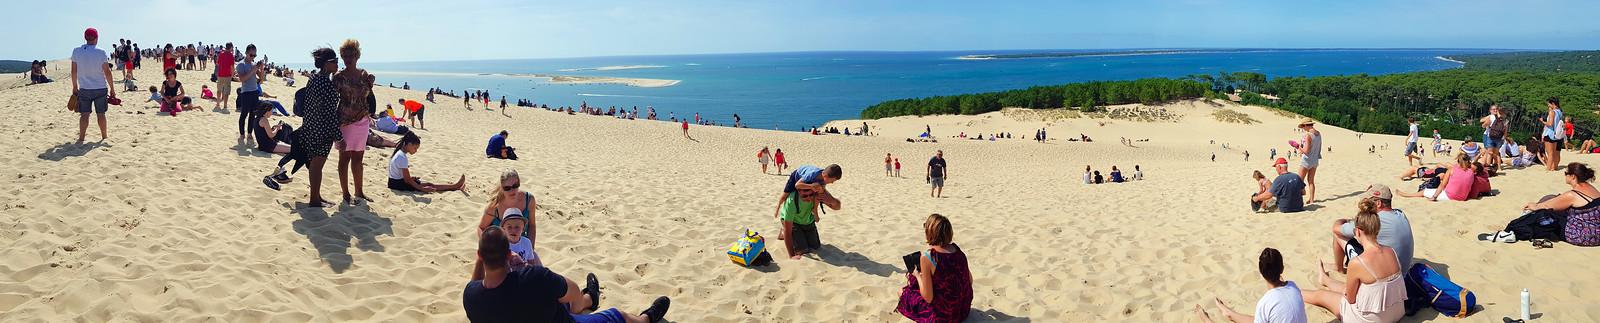 Dune du Pilat Francia Burdeos dune du pilat - 44217262260 db68351bfb h - Dune du Pilat, la duna de arena más alta de Europa